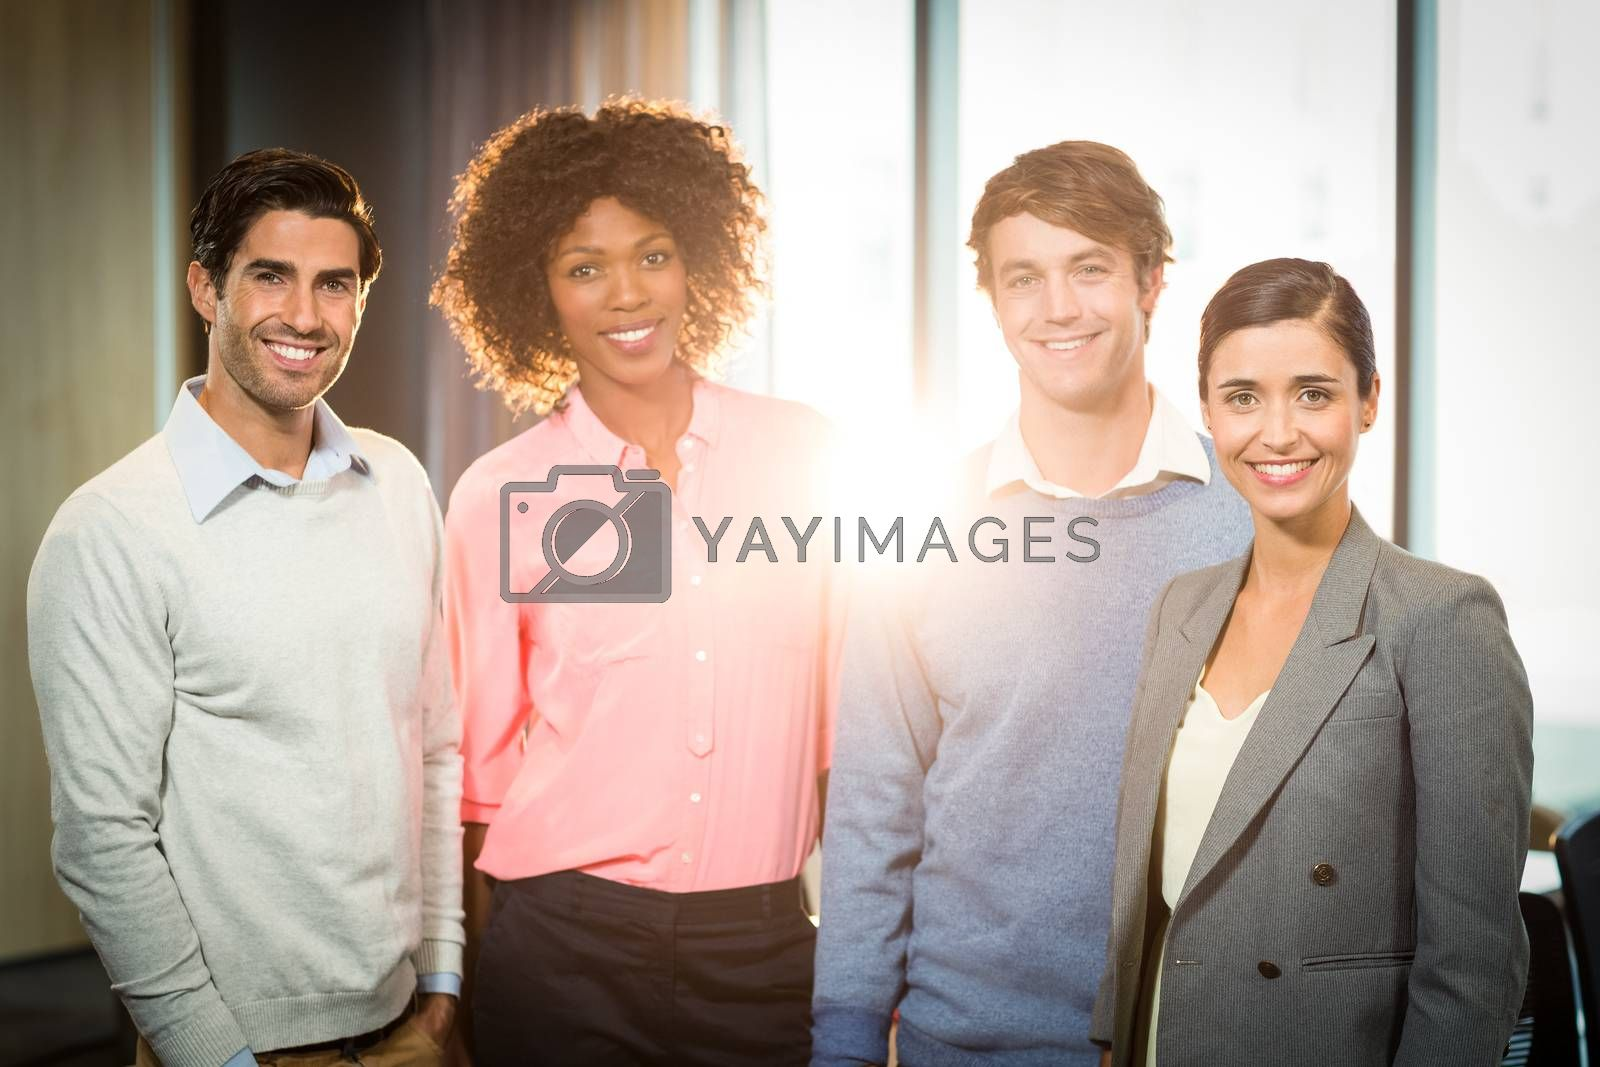 Portrait of business people smiling by Wavebreakmedia